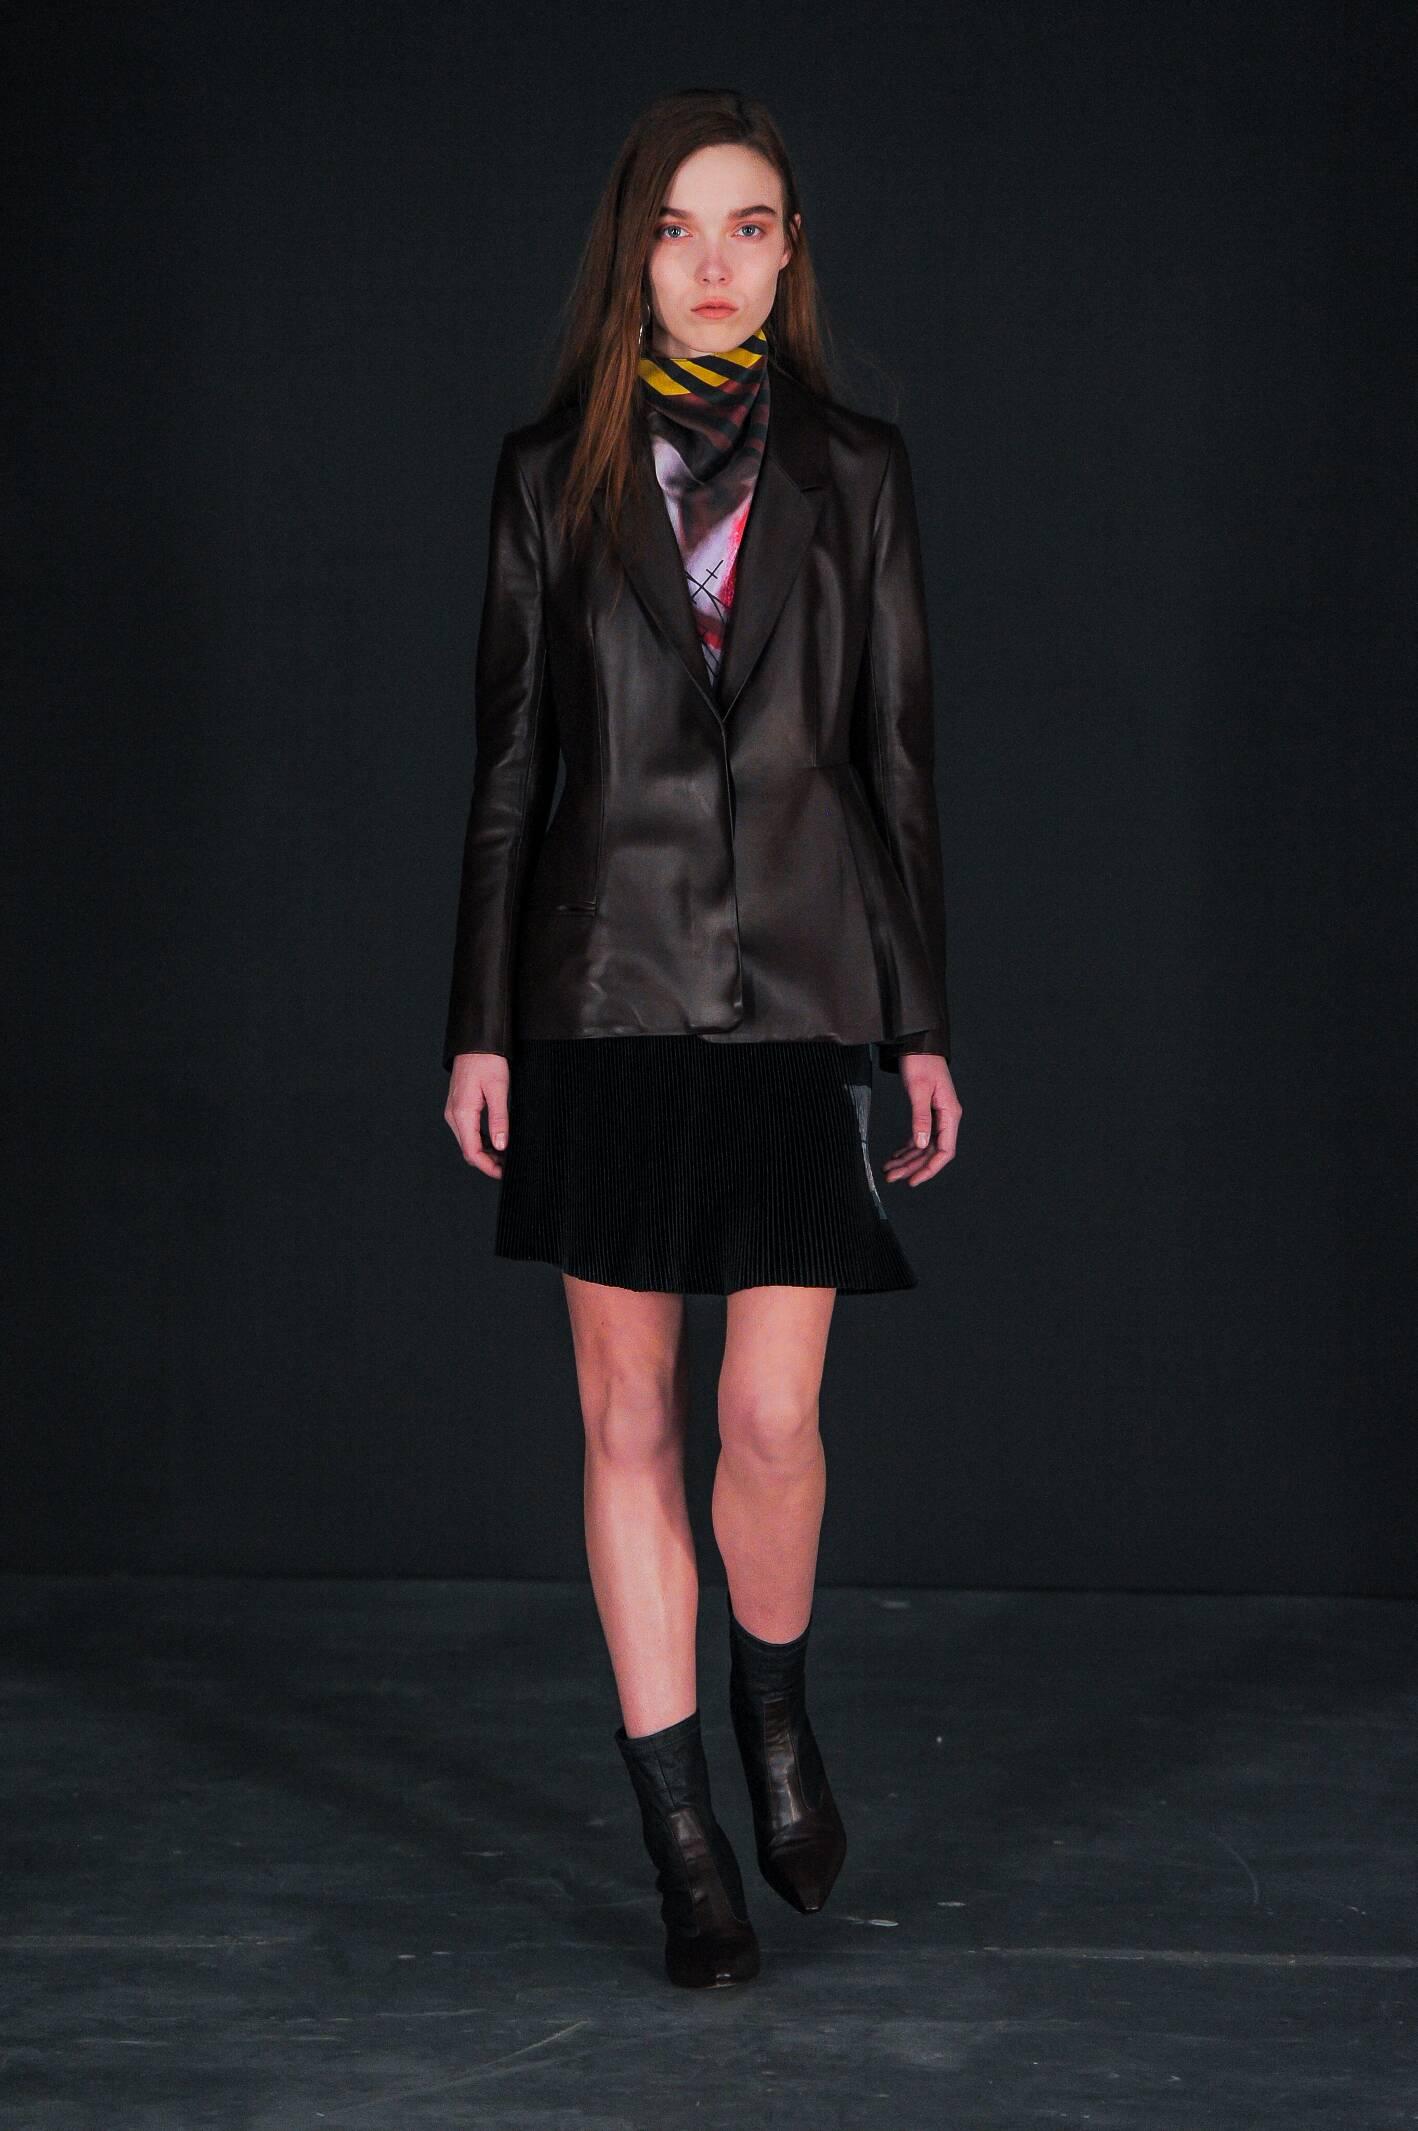 Fall Winter 2015 16 Fashion Collection Thomas Tait